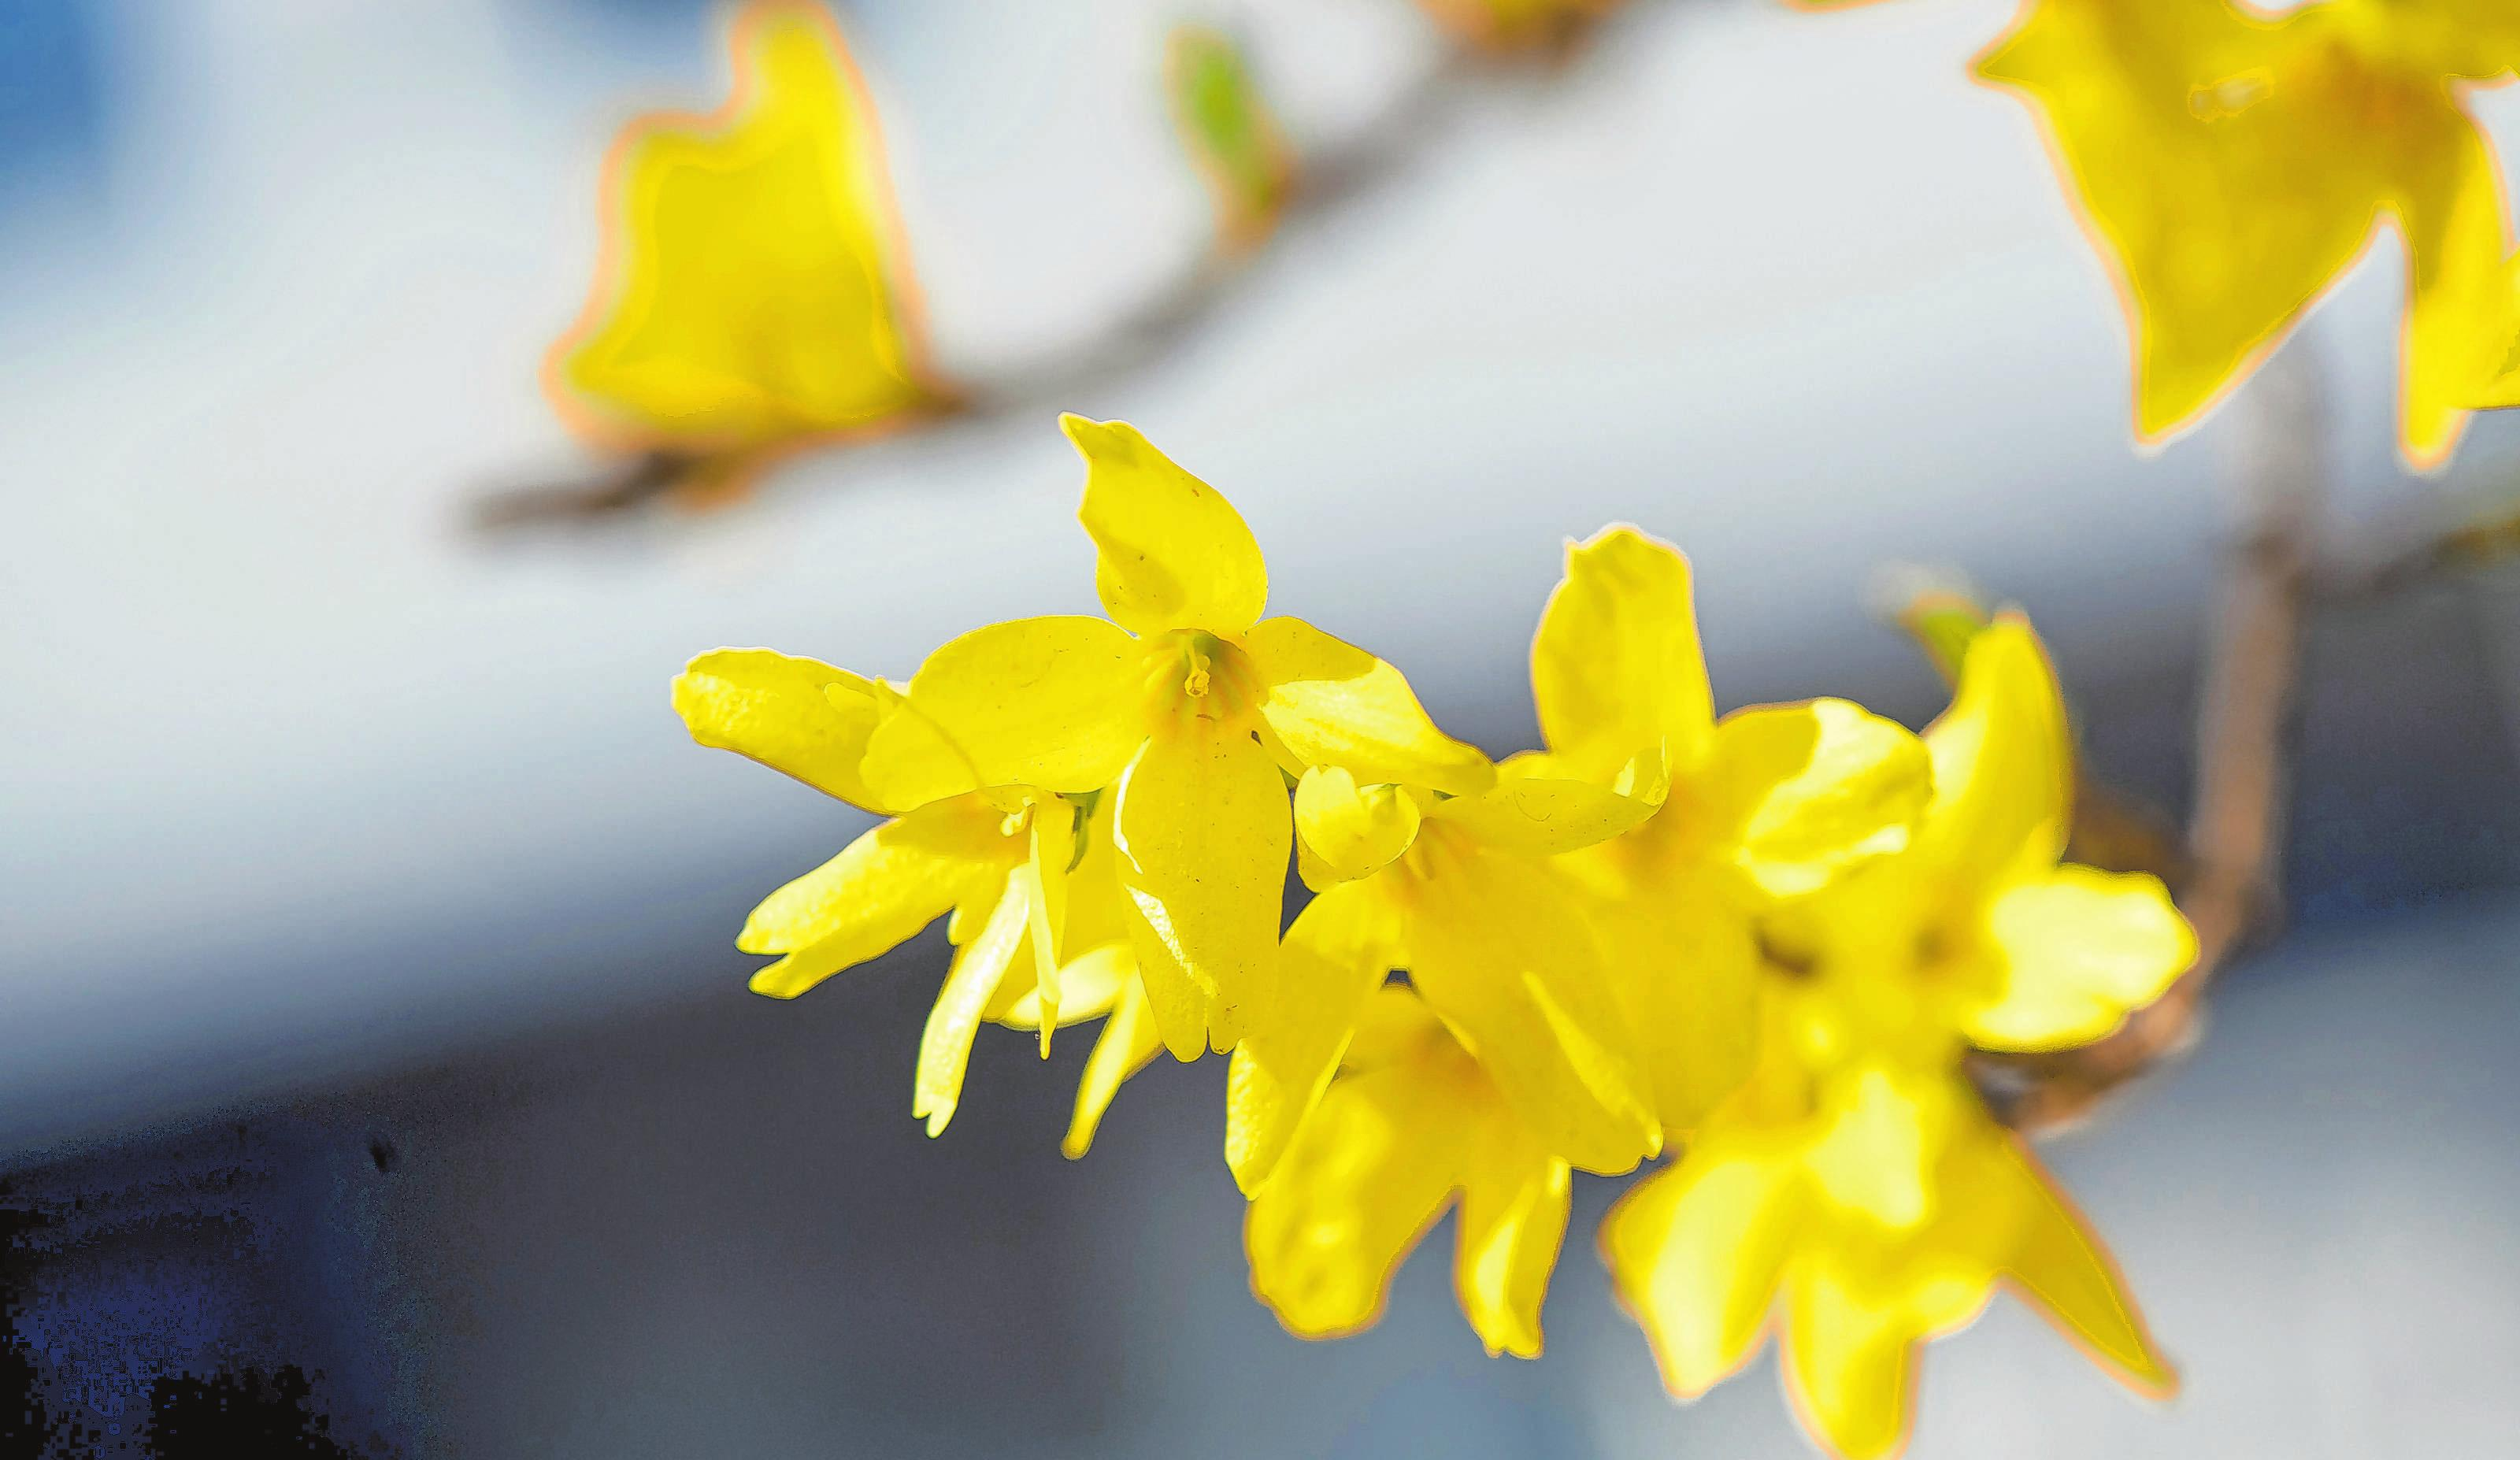 Leuchtend gelb kündigt die Forsythie den Frühling an. Foto: Andrea Warnecke/dpa-mag